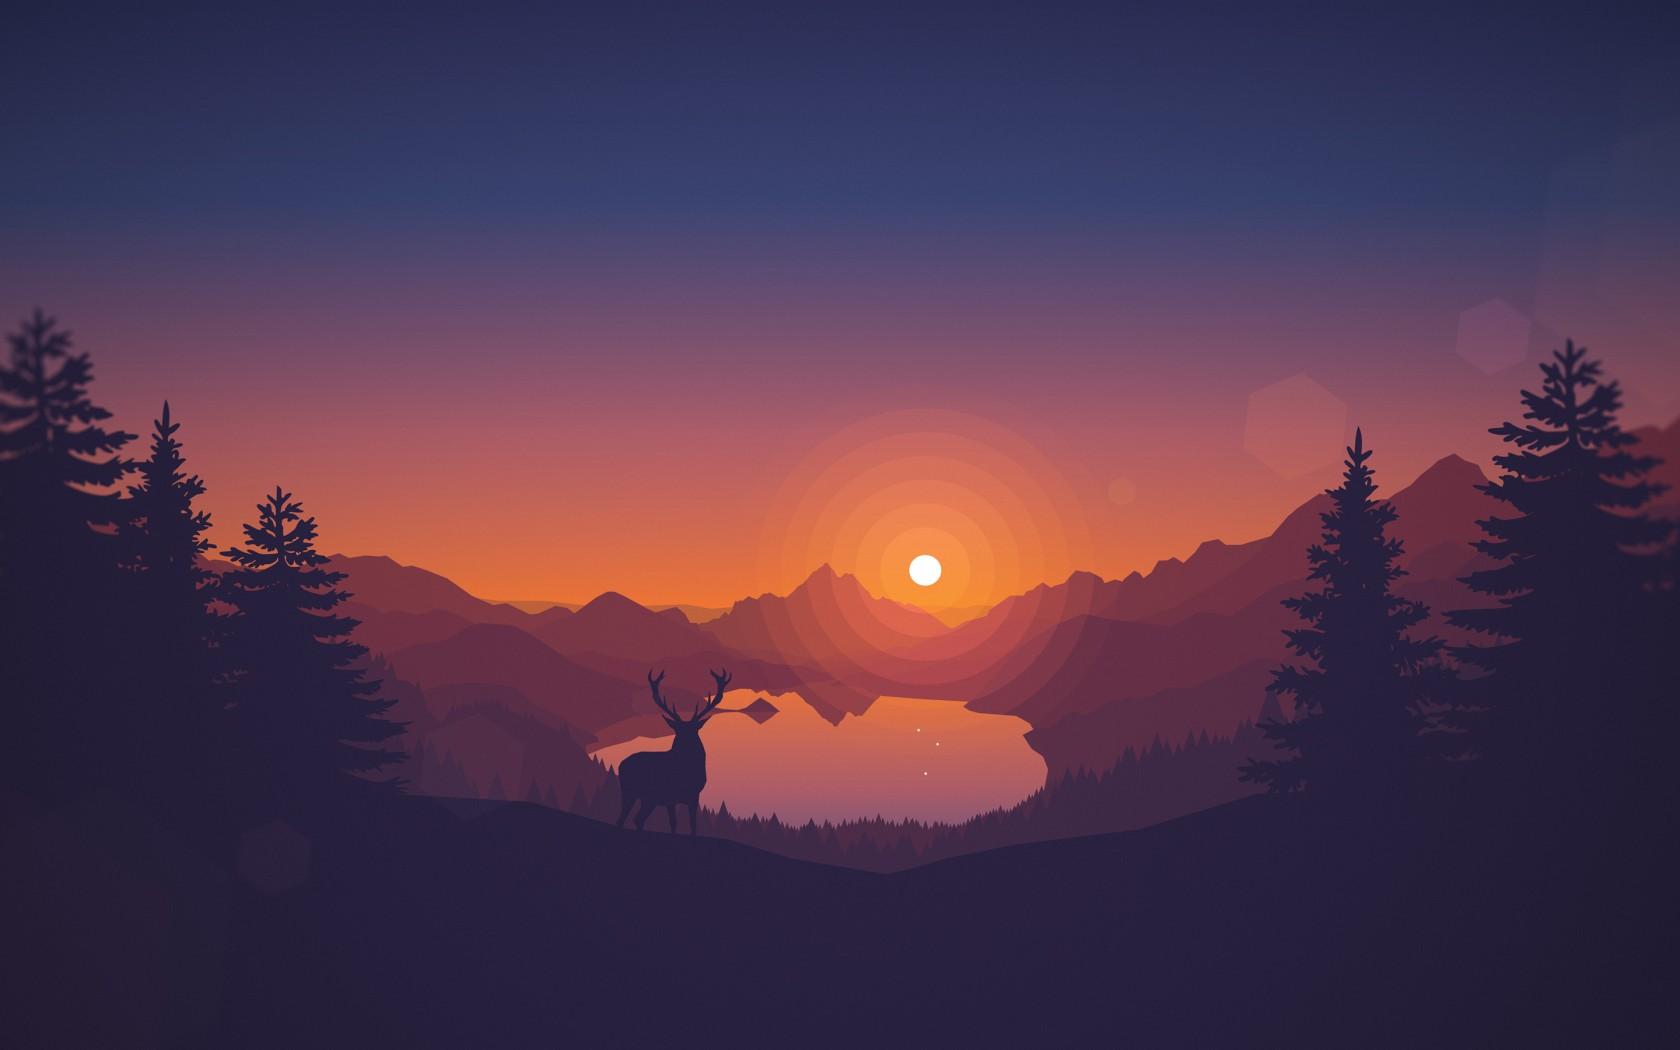 Free Fall Desktop Wallpaper Downloads Lakeview Sunset 4k Wallpapers Hd Wallpapers Id 23632